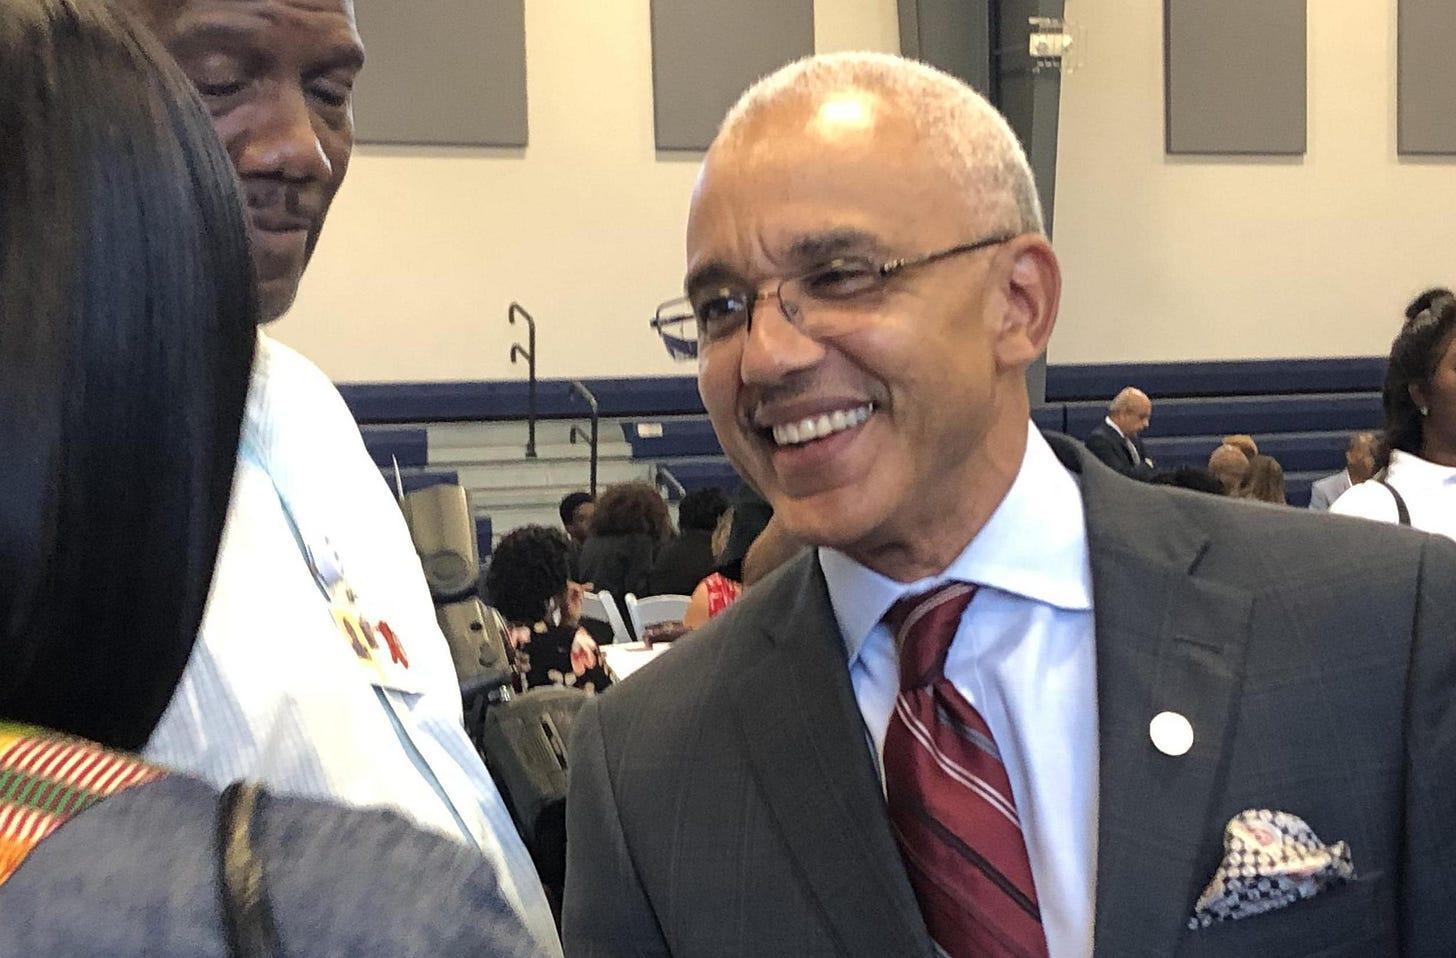 B-CU president Brent Chrite: Accreditation 'very much in doubt' - News -  Daytona Beach News-Journal Online - Daytona Beach, FL